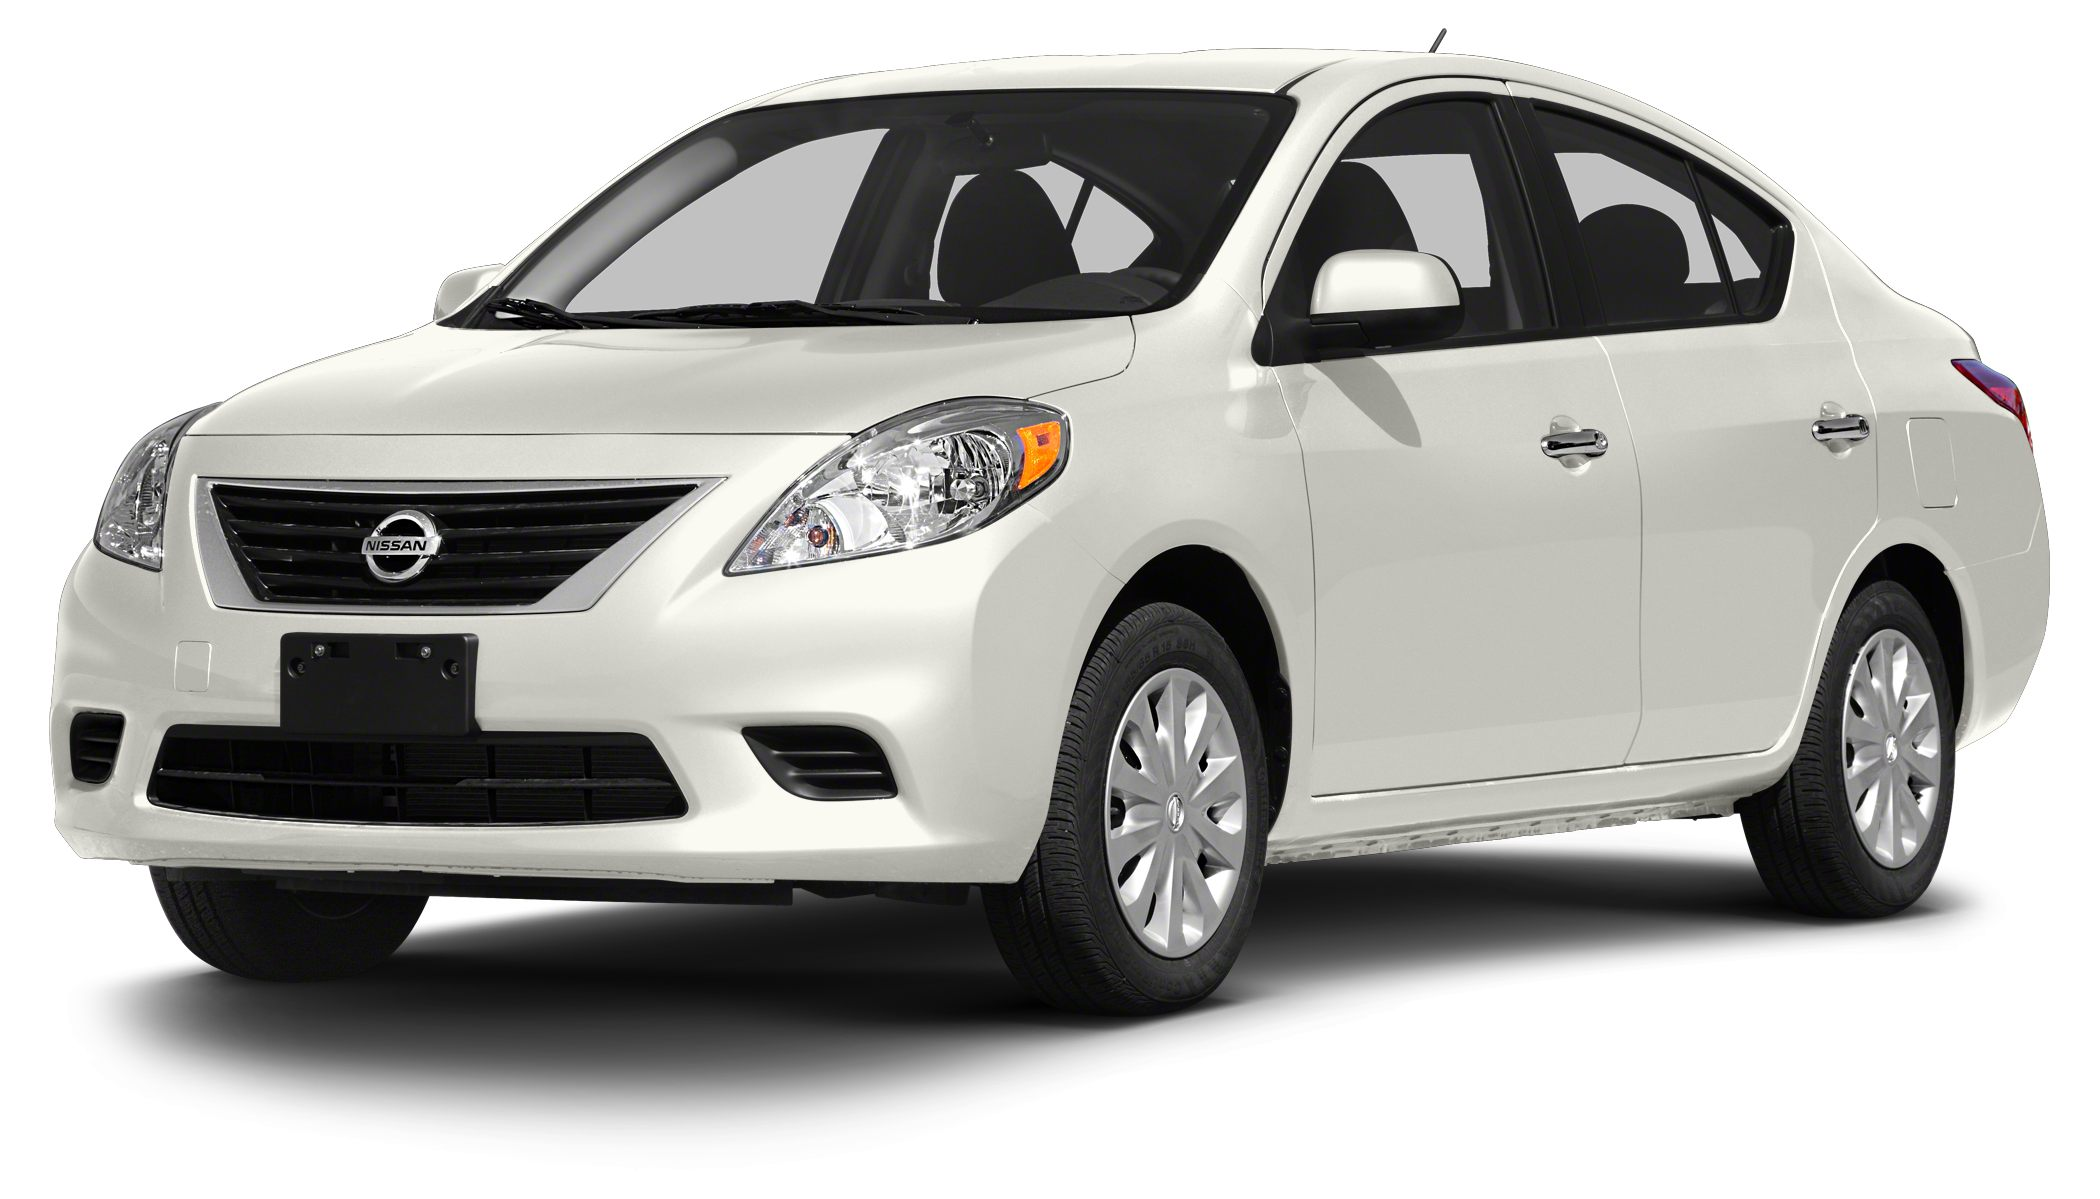 2013 Nissan Versa 16 SV Miles 65230Color Fresh Powder Stock U7237 VIN 3N1CN7AP1DL828640